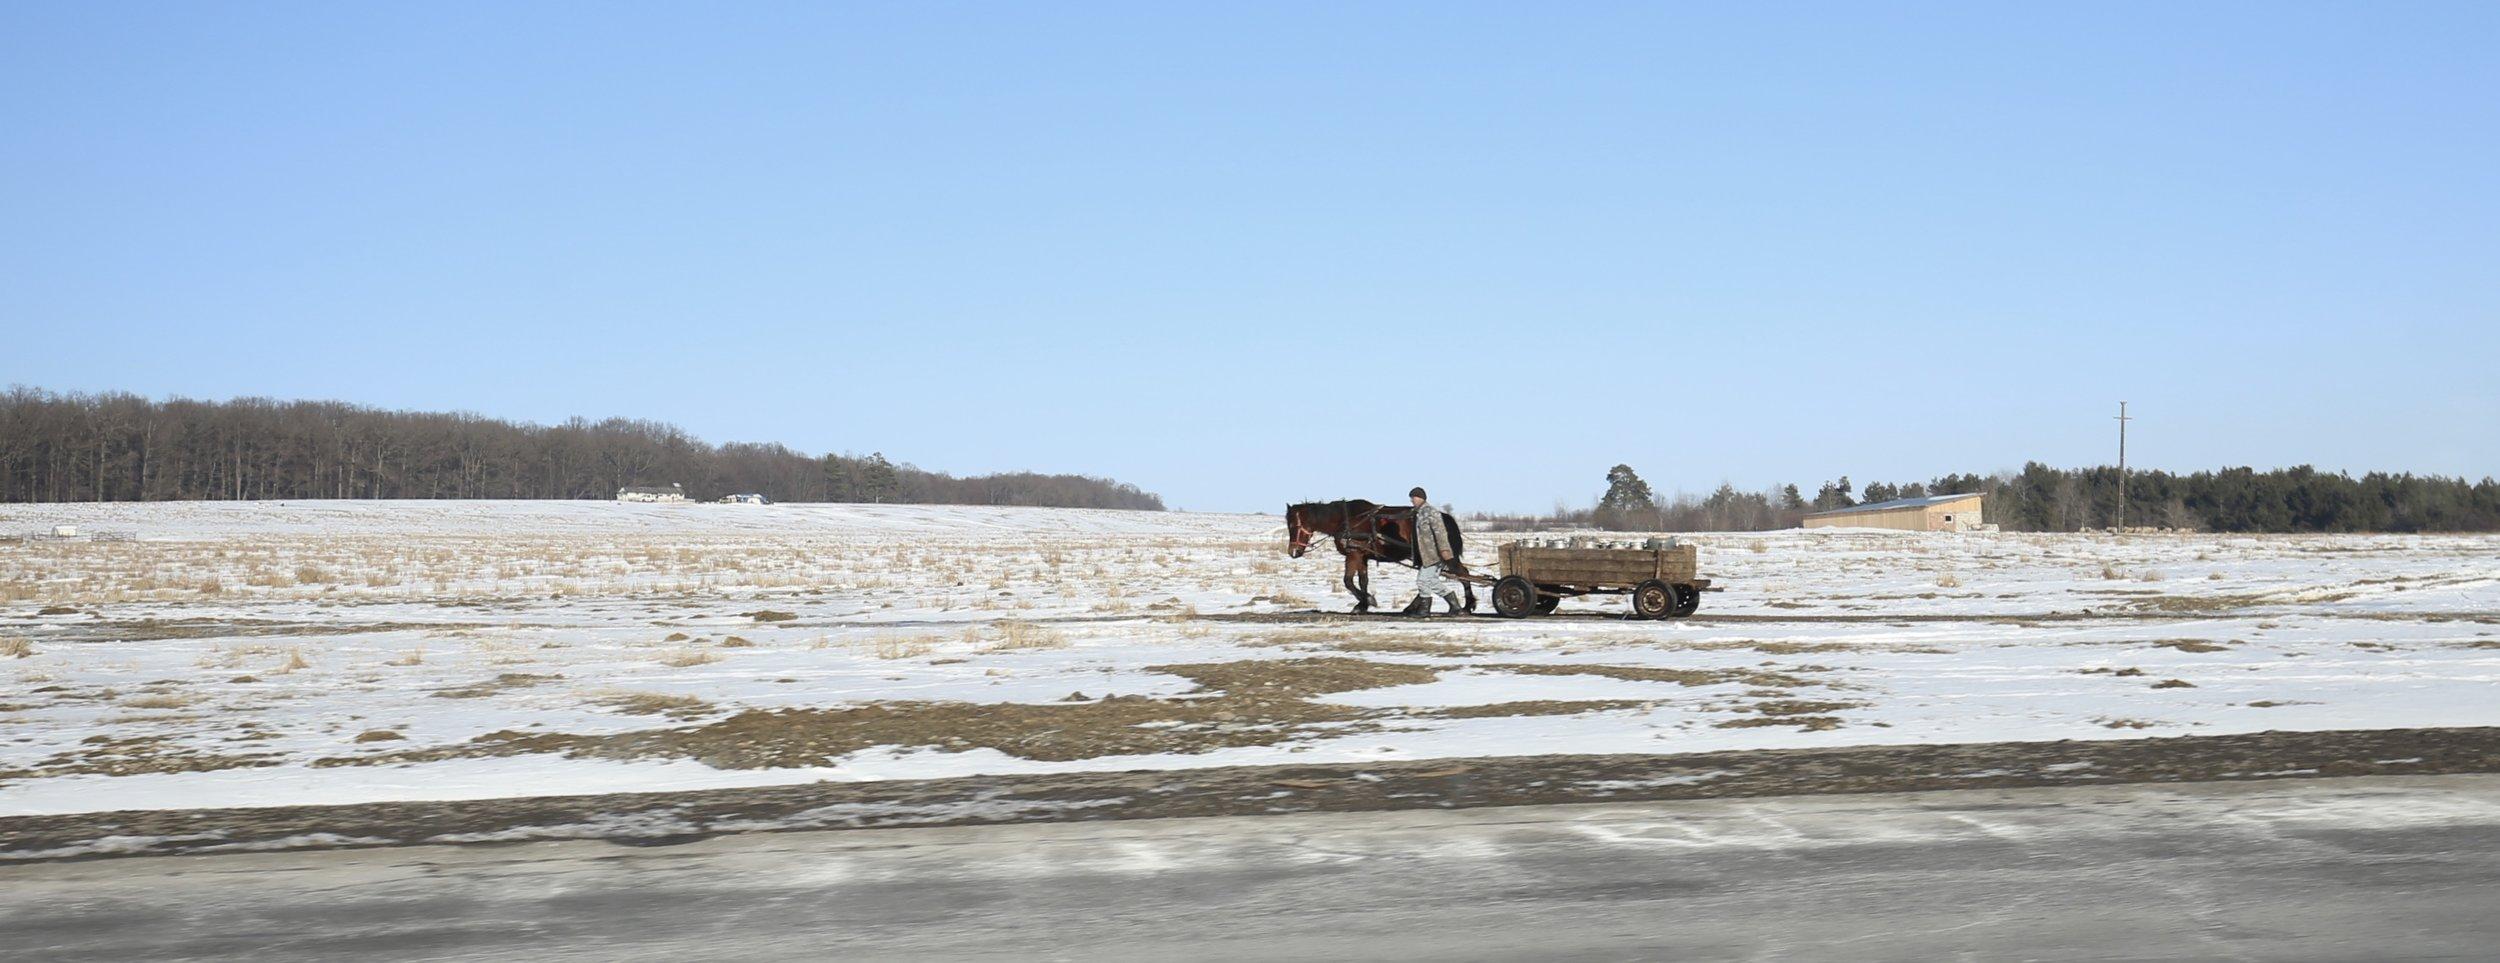 A romanian villager walks with a horse and cart across frozen fields.